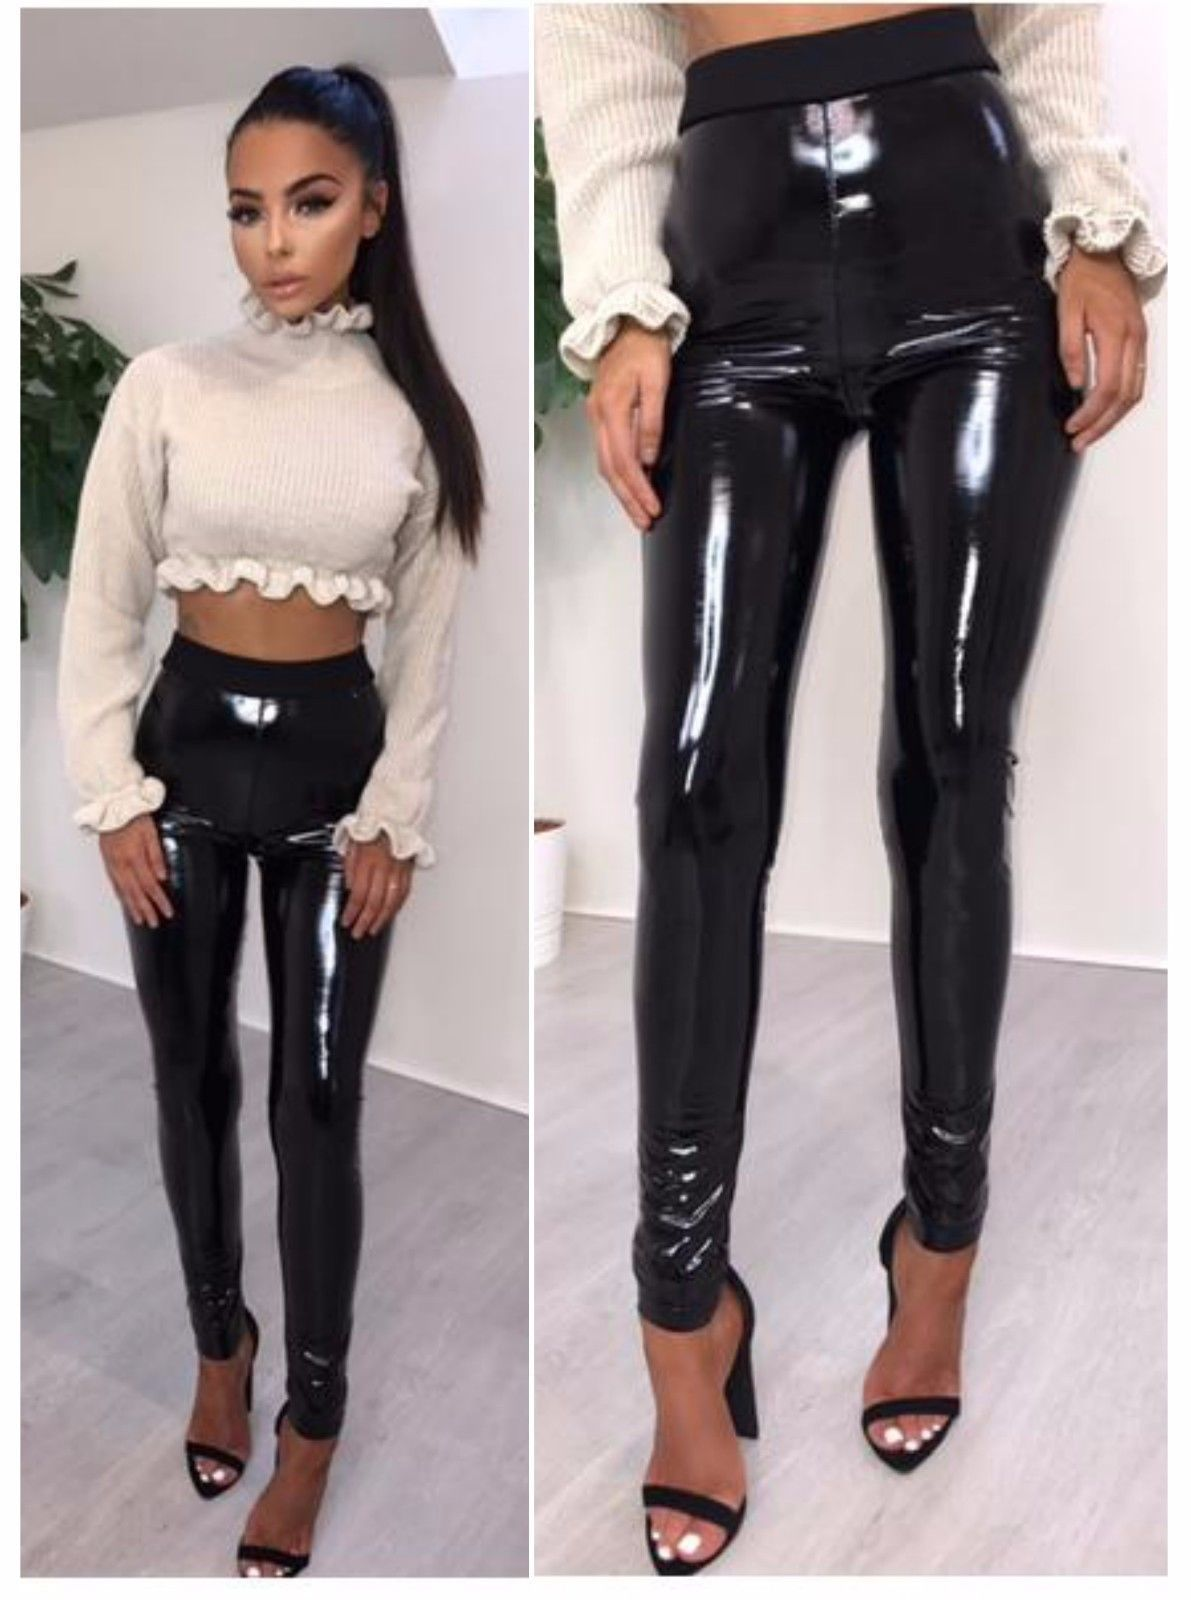 New fashion Women Ladies Soft Stretchy Shiny Wet Look PU leather Leggings Trouser Pants stylish female skinny black pants